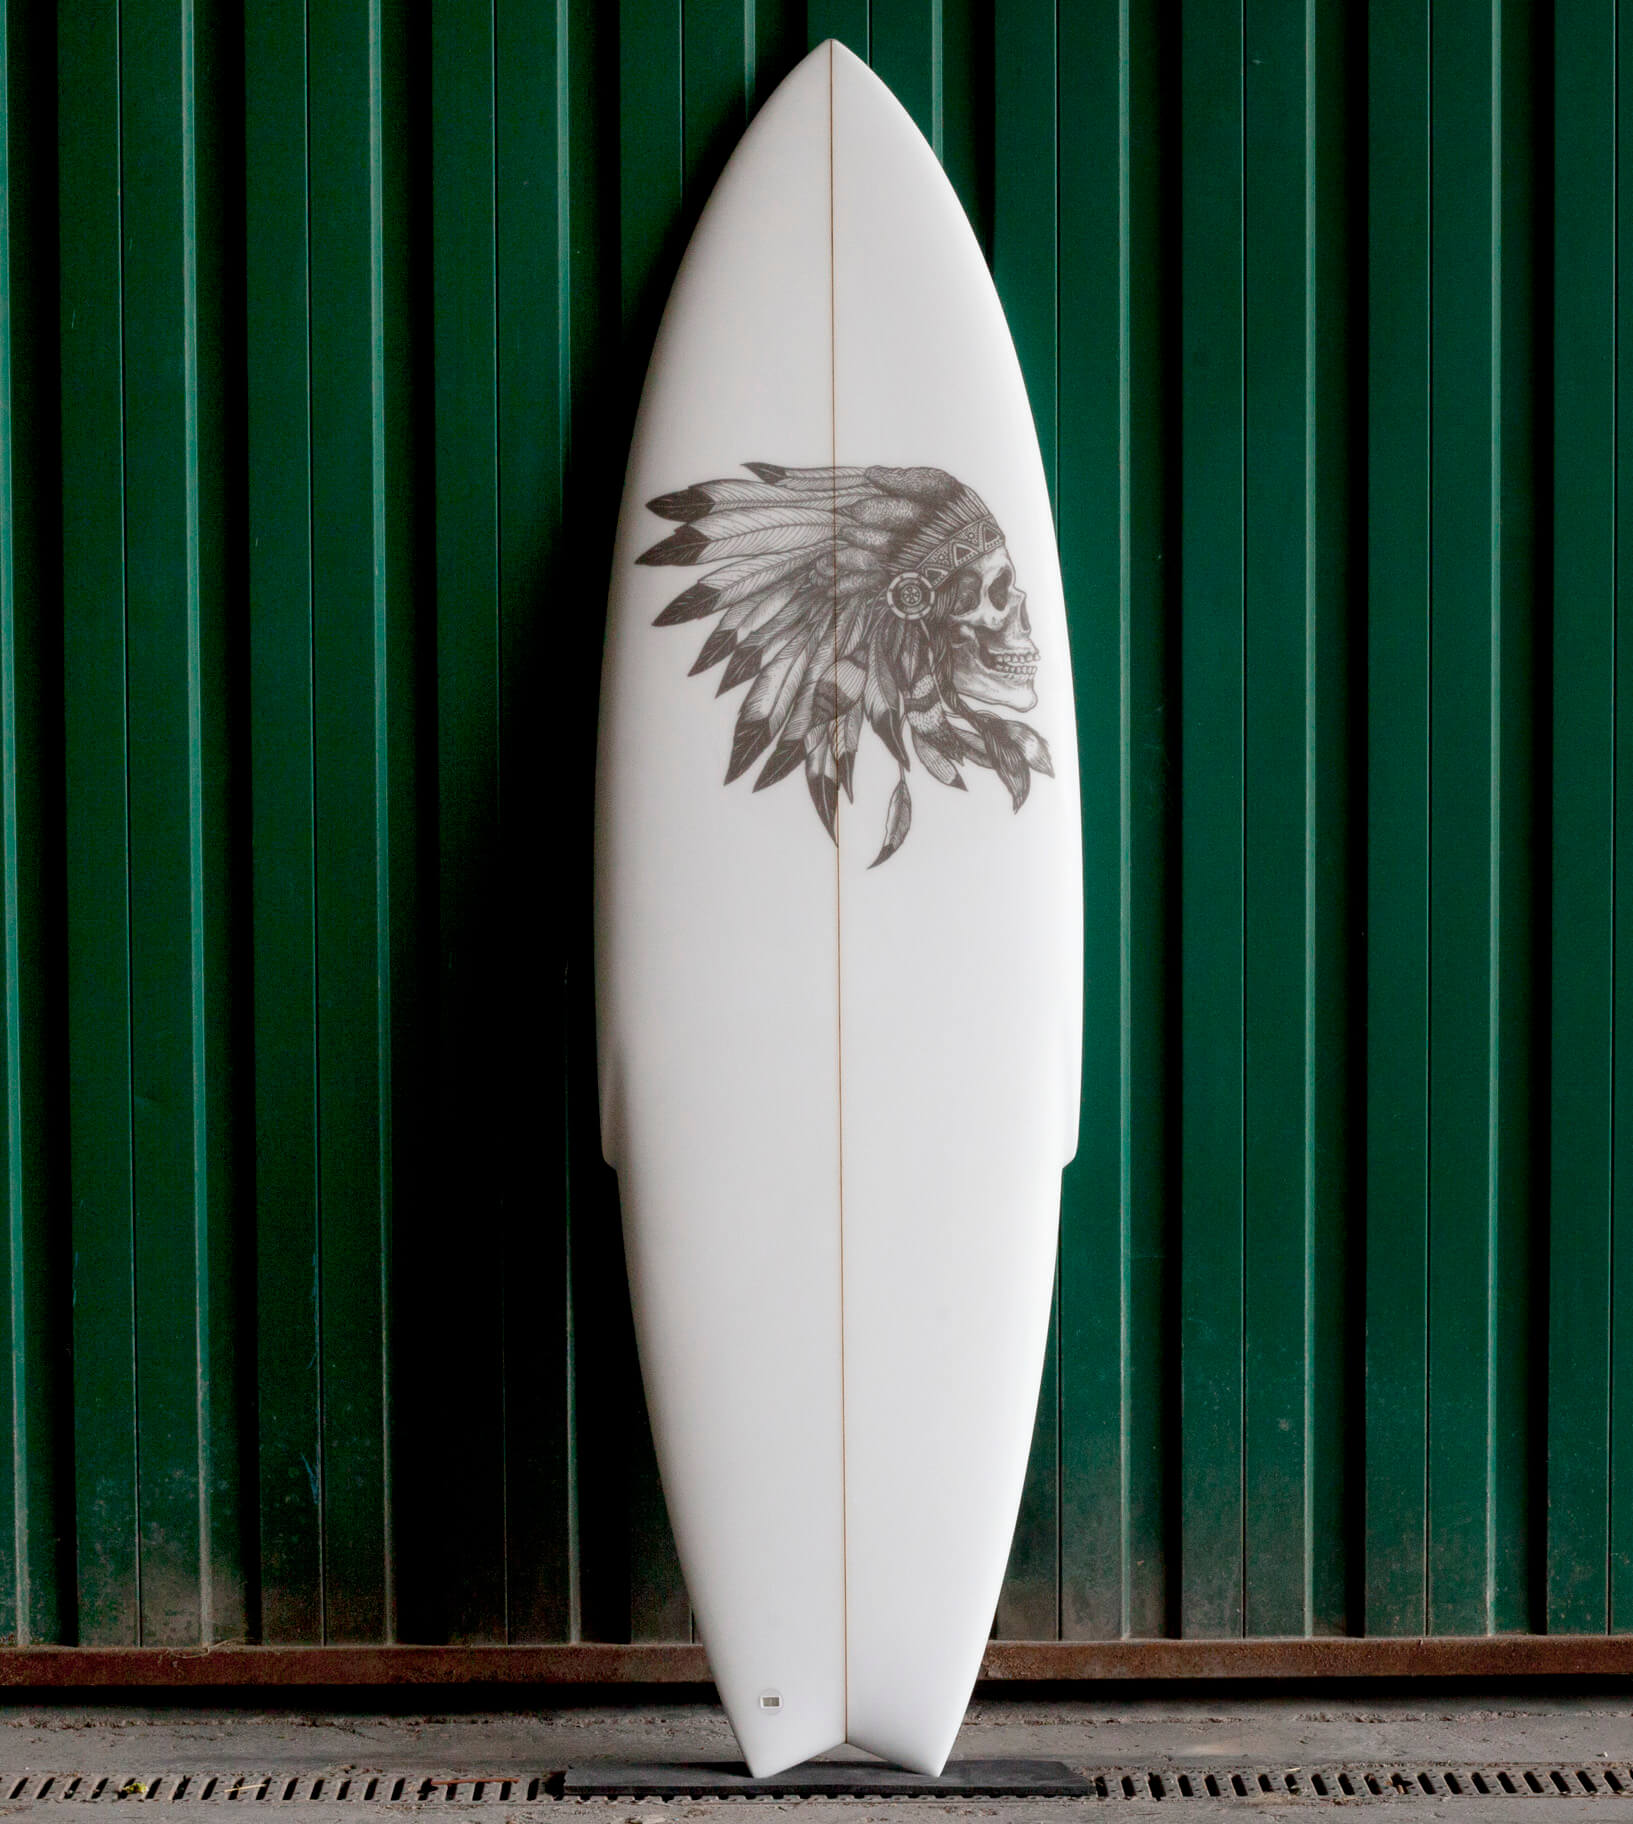 cabianca surfboards gabriel medina thesting shortboard